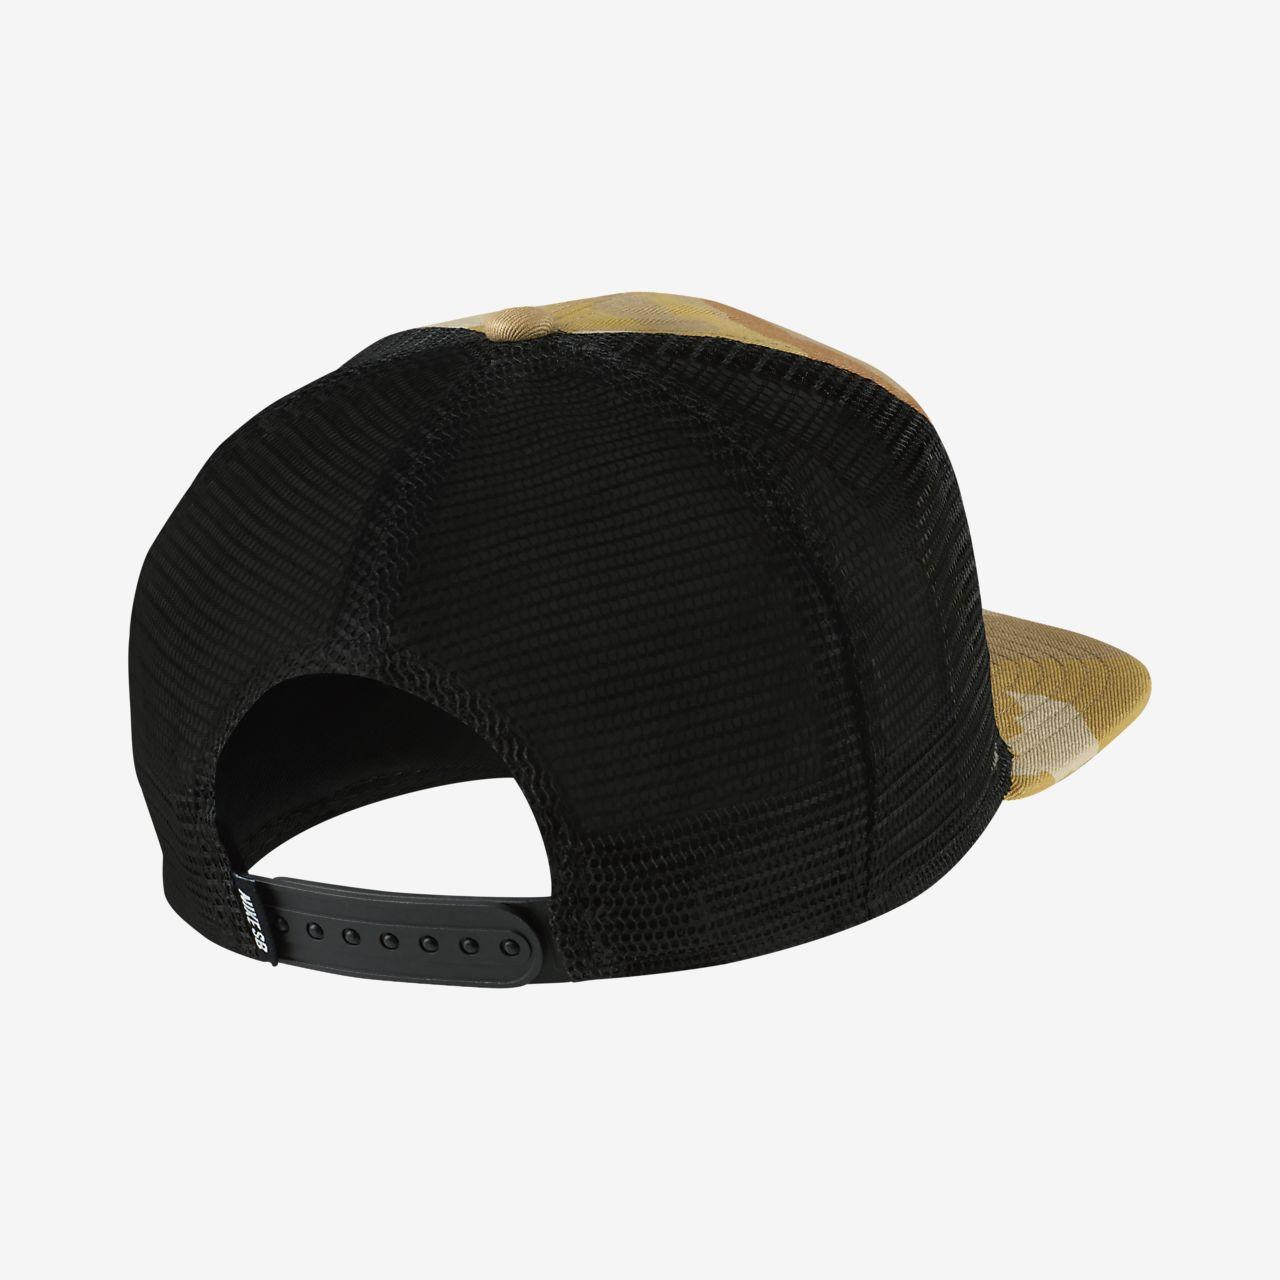 1a9609b8fc3 Nike SB Skate Trucker Hat. Nike.com SG